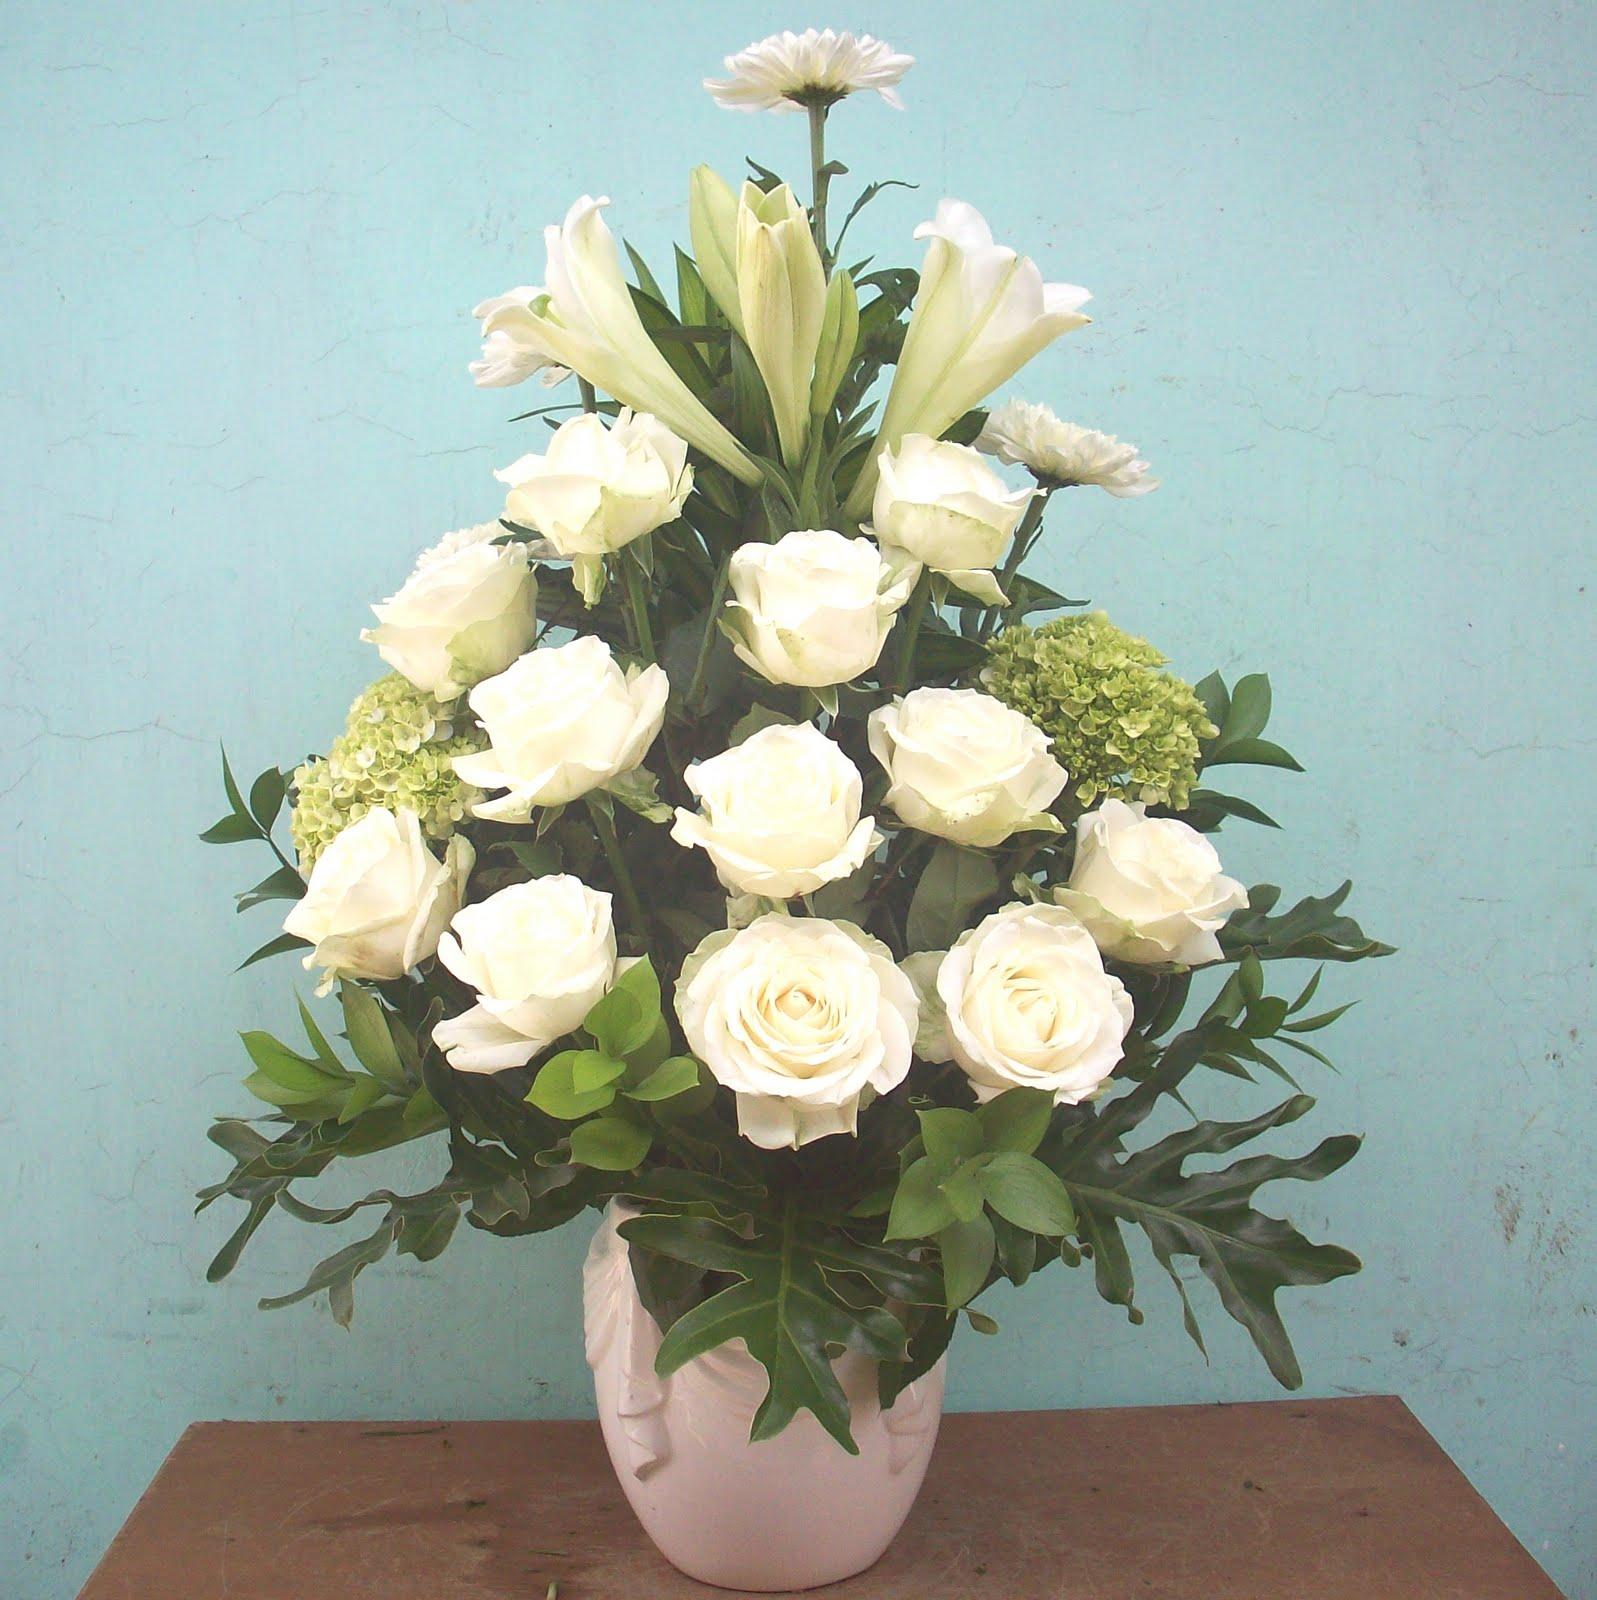 Nafflorist Rangkaian Bunga Segar Mewah Namun Dengan Harga Murah